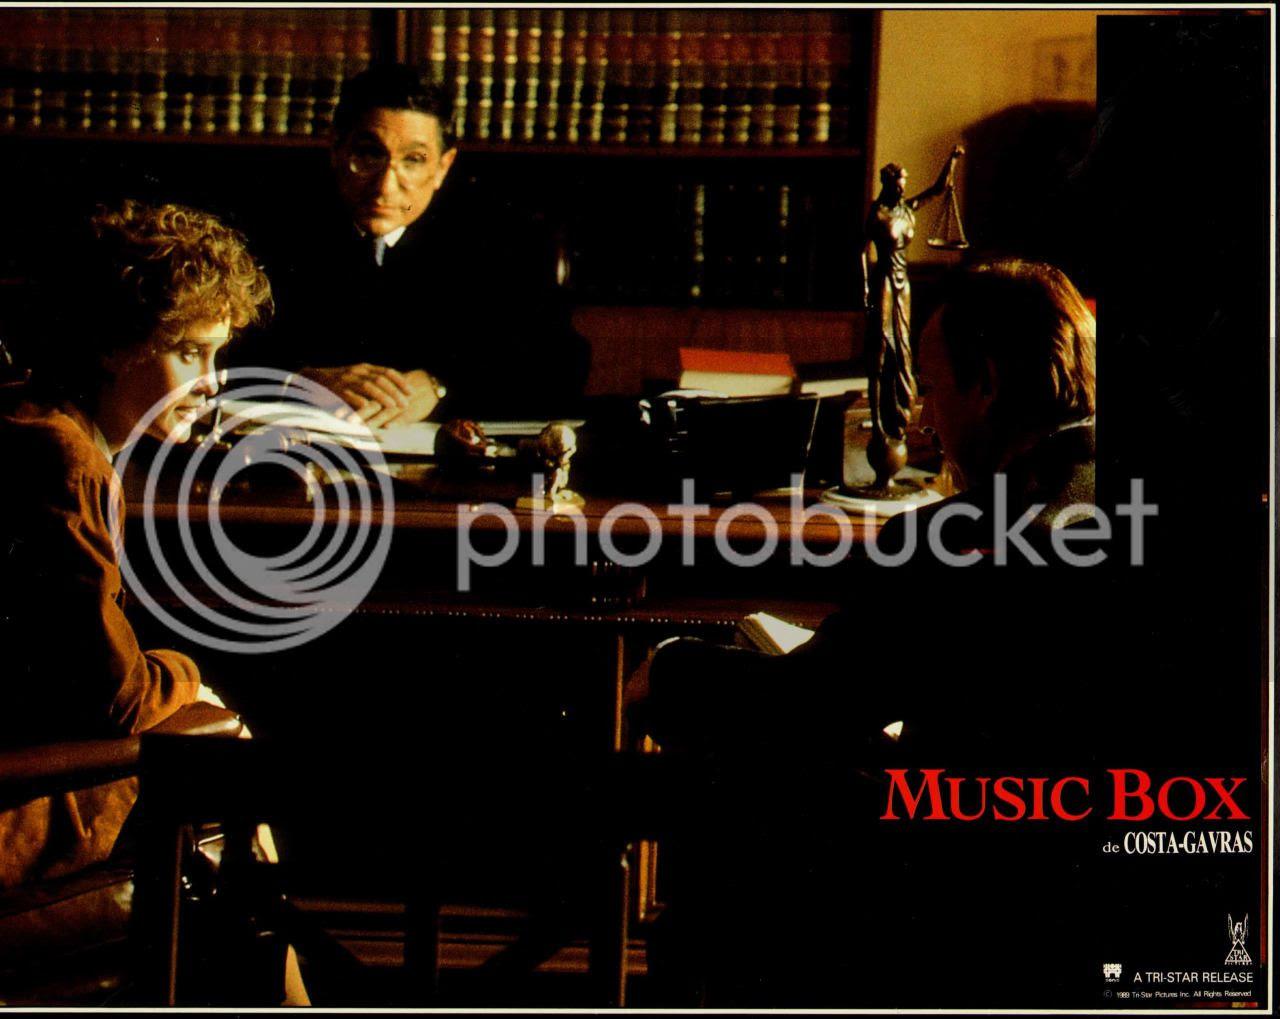 photo gr_musicbox-9.jpg